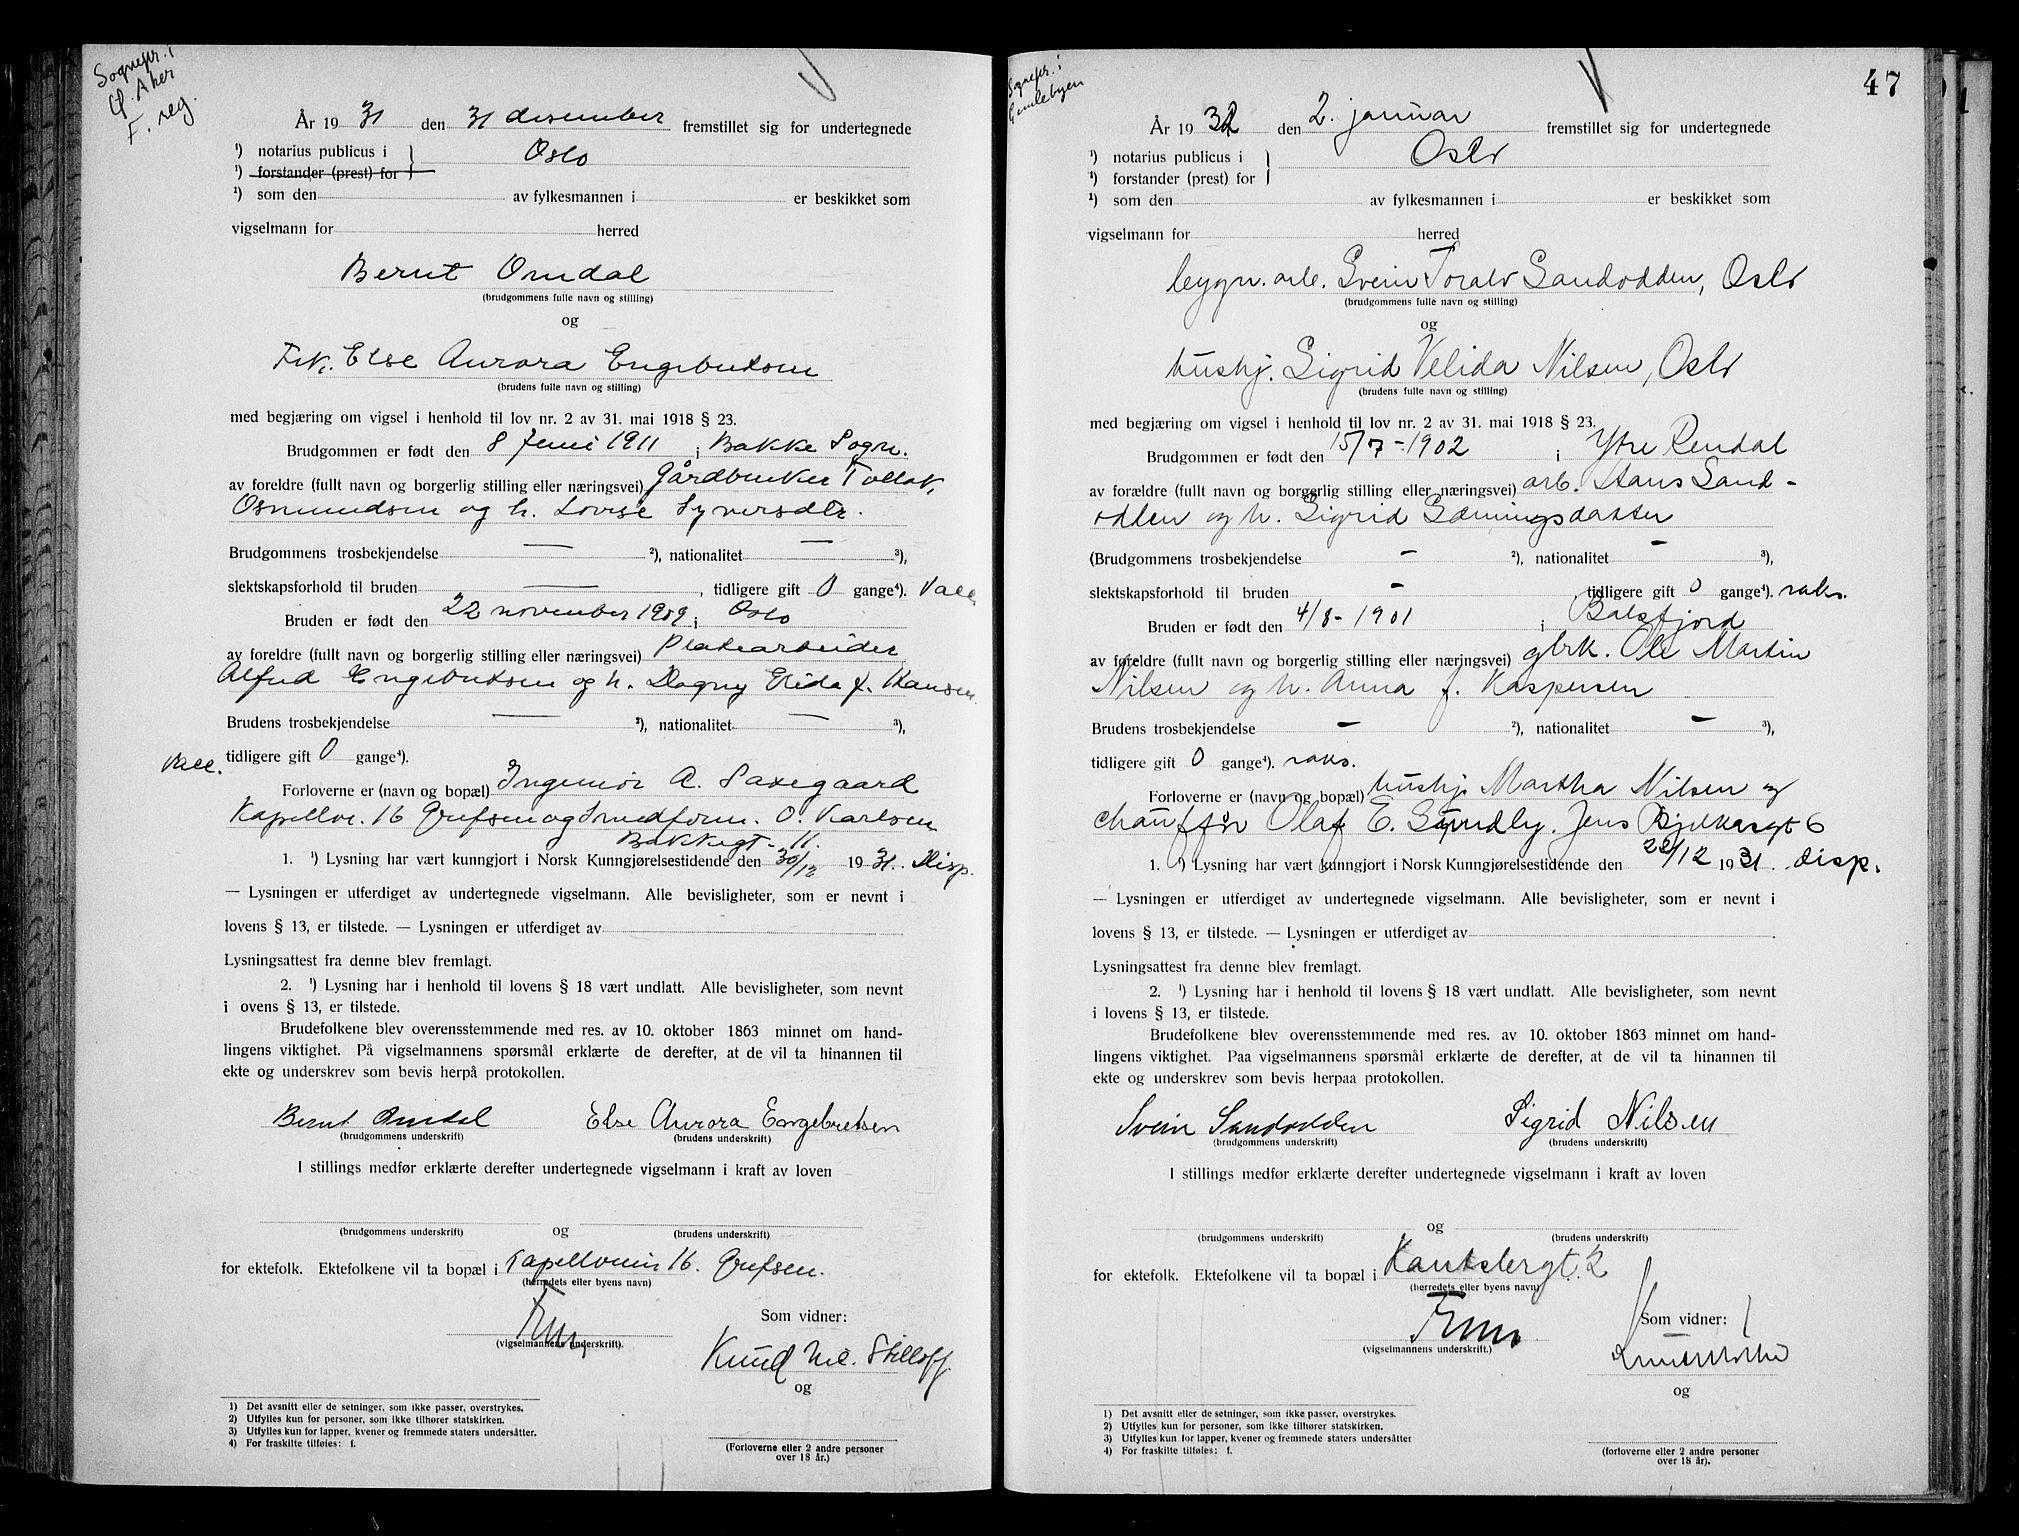 SAO, Oslo byfogd avd. I, L/Lb/Lbb/L0021: Notarialprotokoll, rekke II: Vigsler, 1930-1932, s. 46b-47a